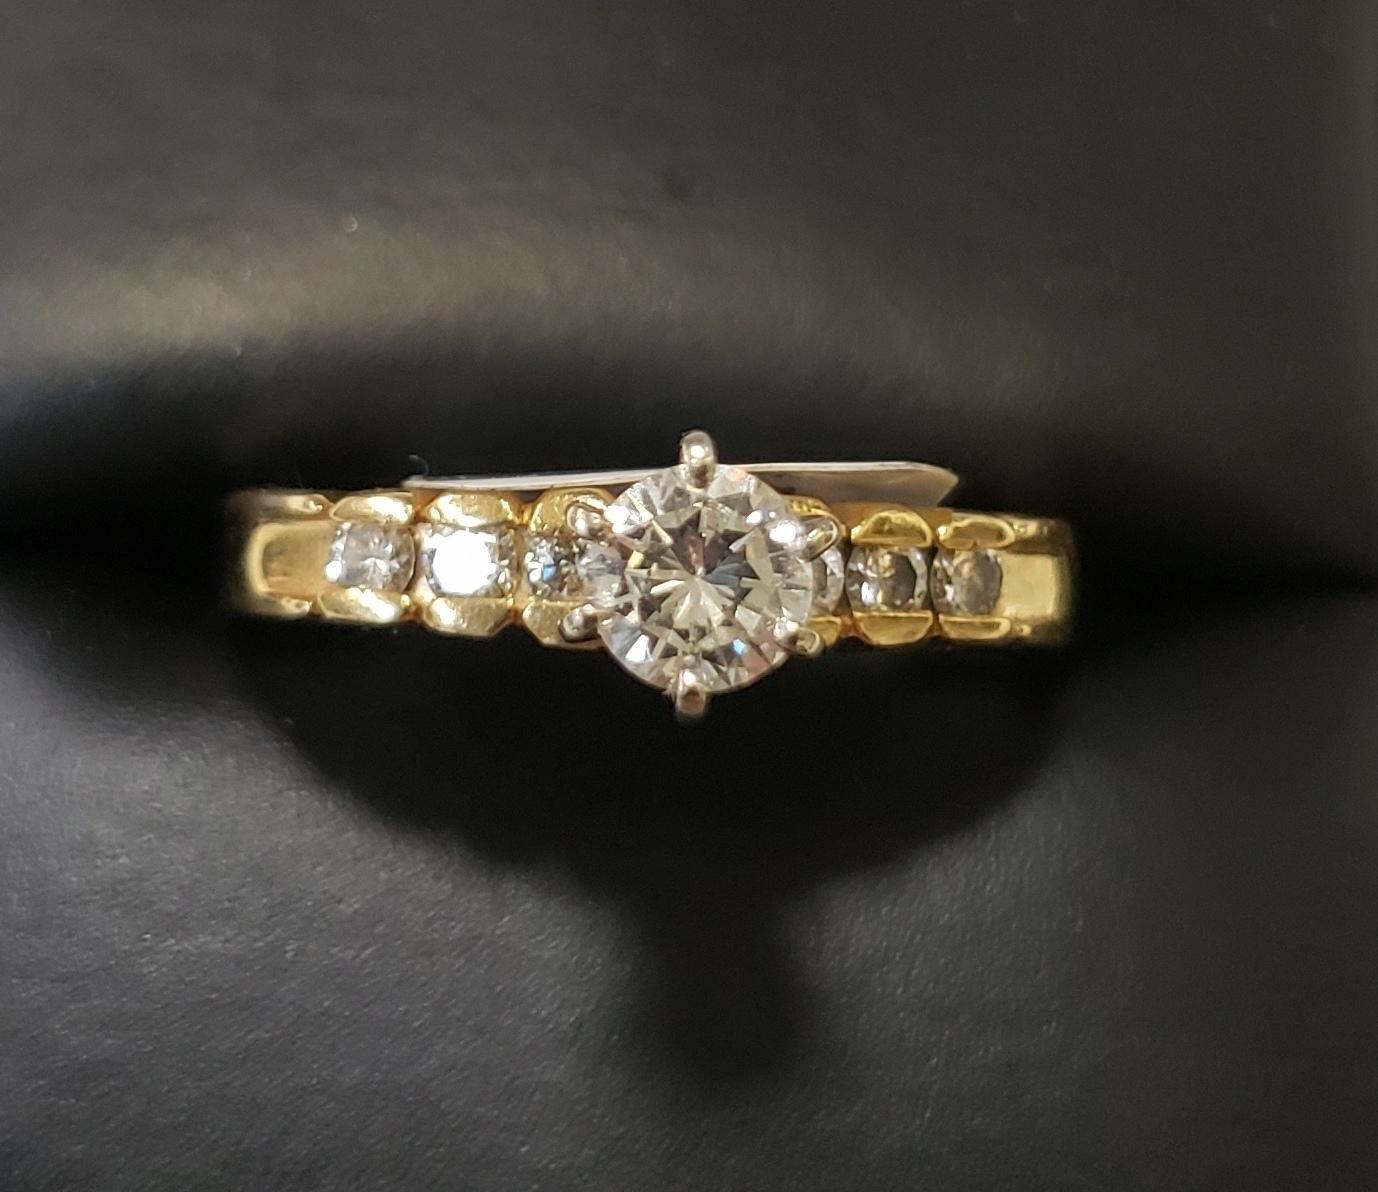 14KT SIZE 8.5 YELLOW GOLD 1/3 ROUND CENTER DIAMOND W 6 DIAMOND CHIPS